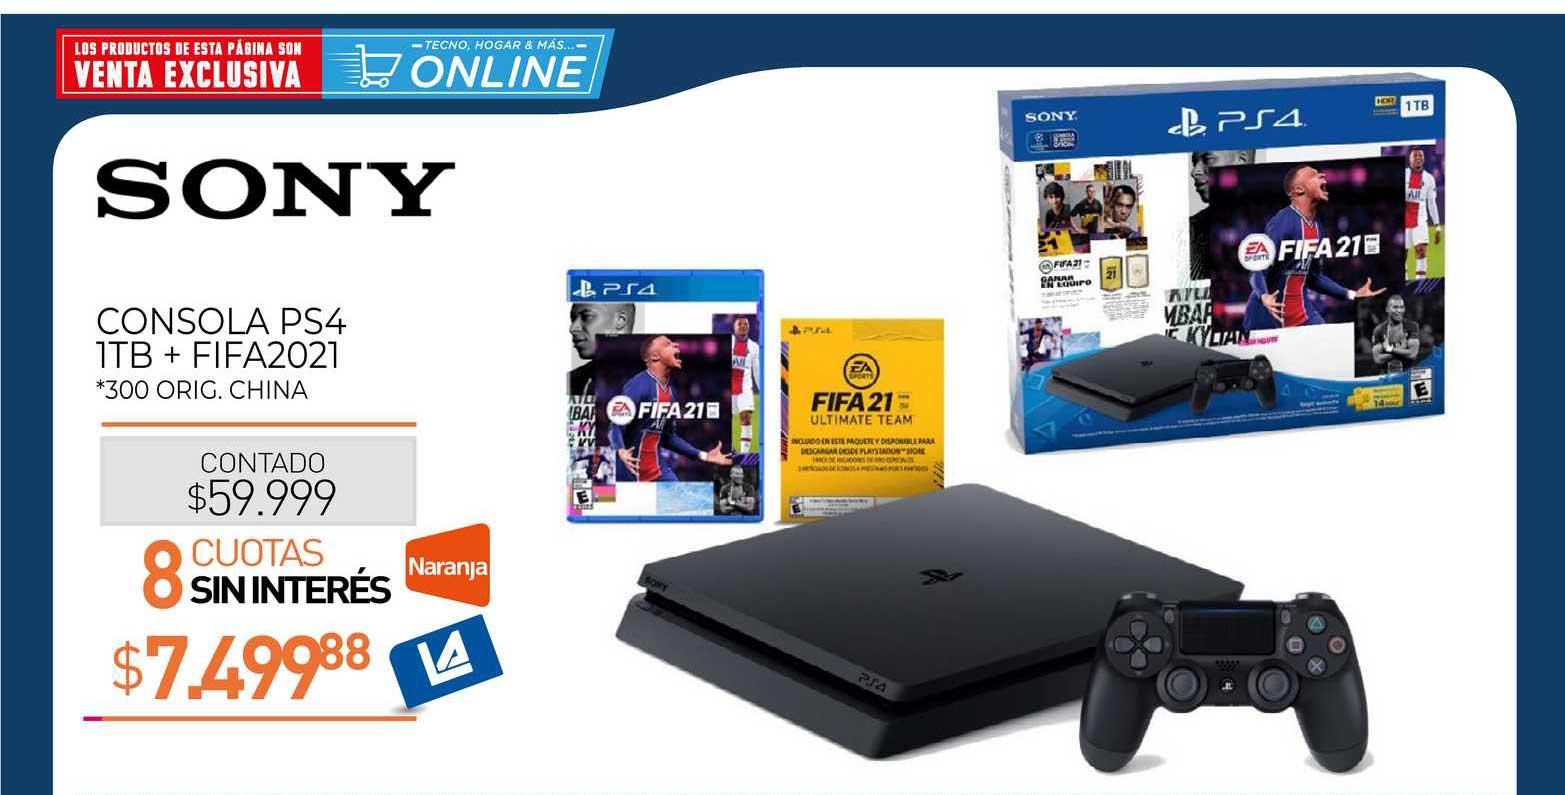 La Anónima Sony Consola PS4 1TB + FIFA2021